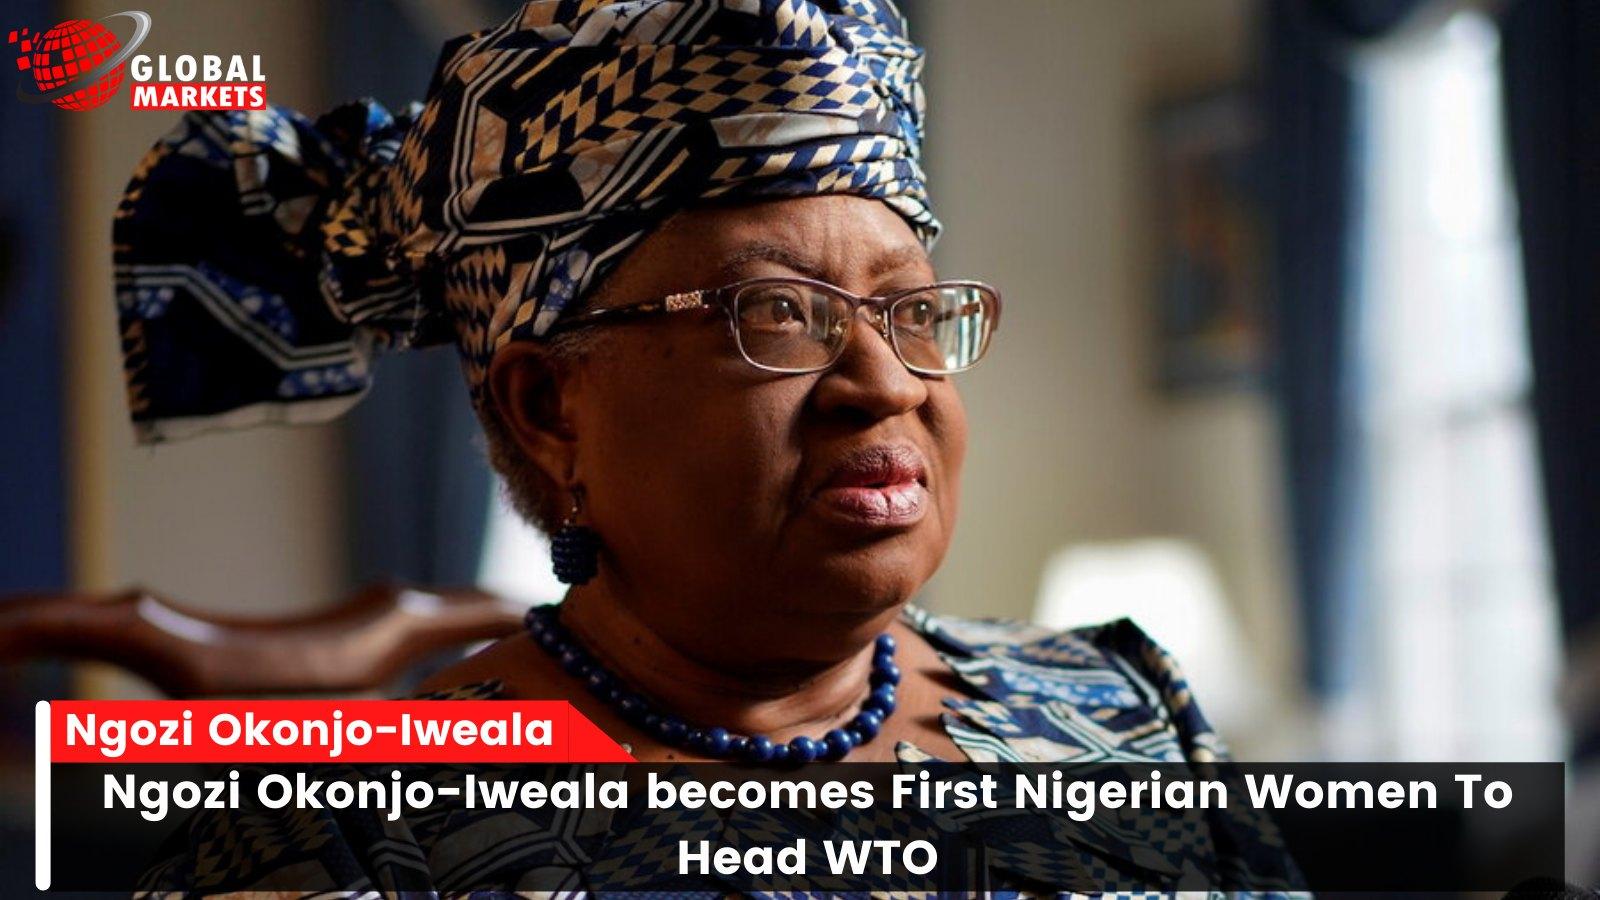 Ngozi Okonjo-Iweala becomes First Nigerian Women To Head WTO